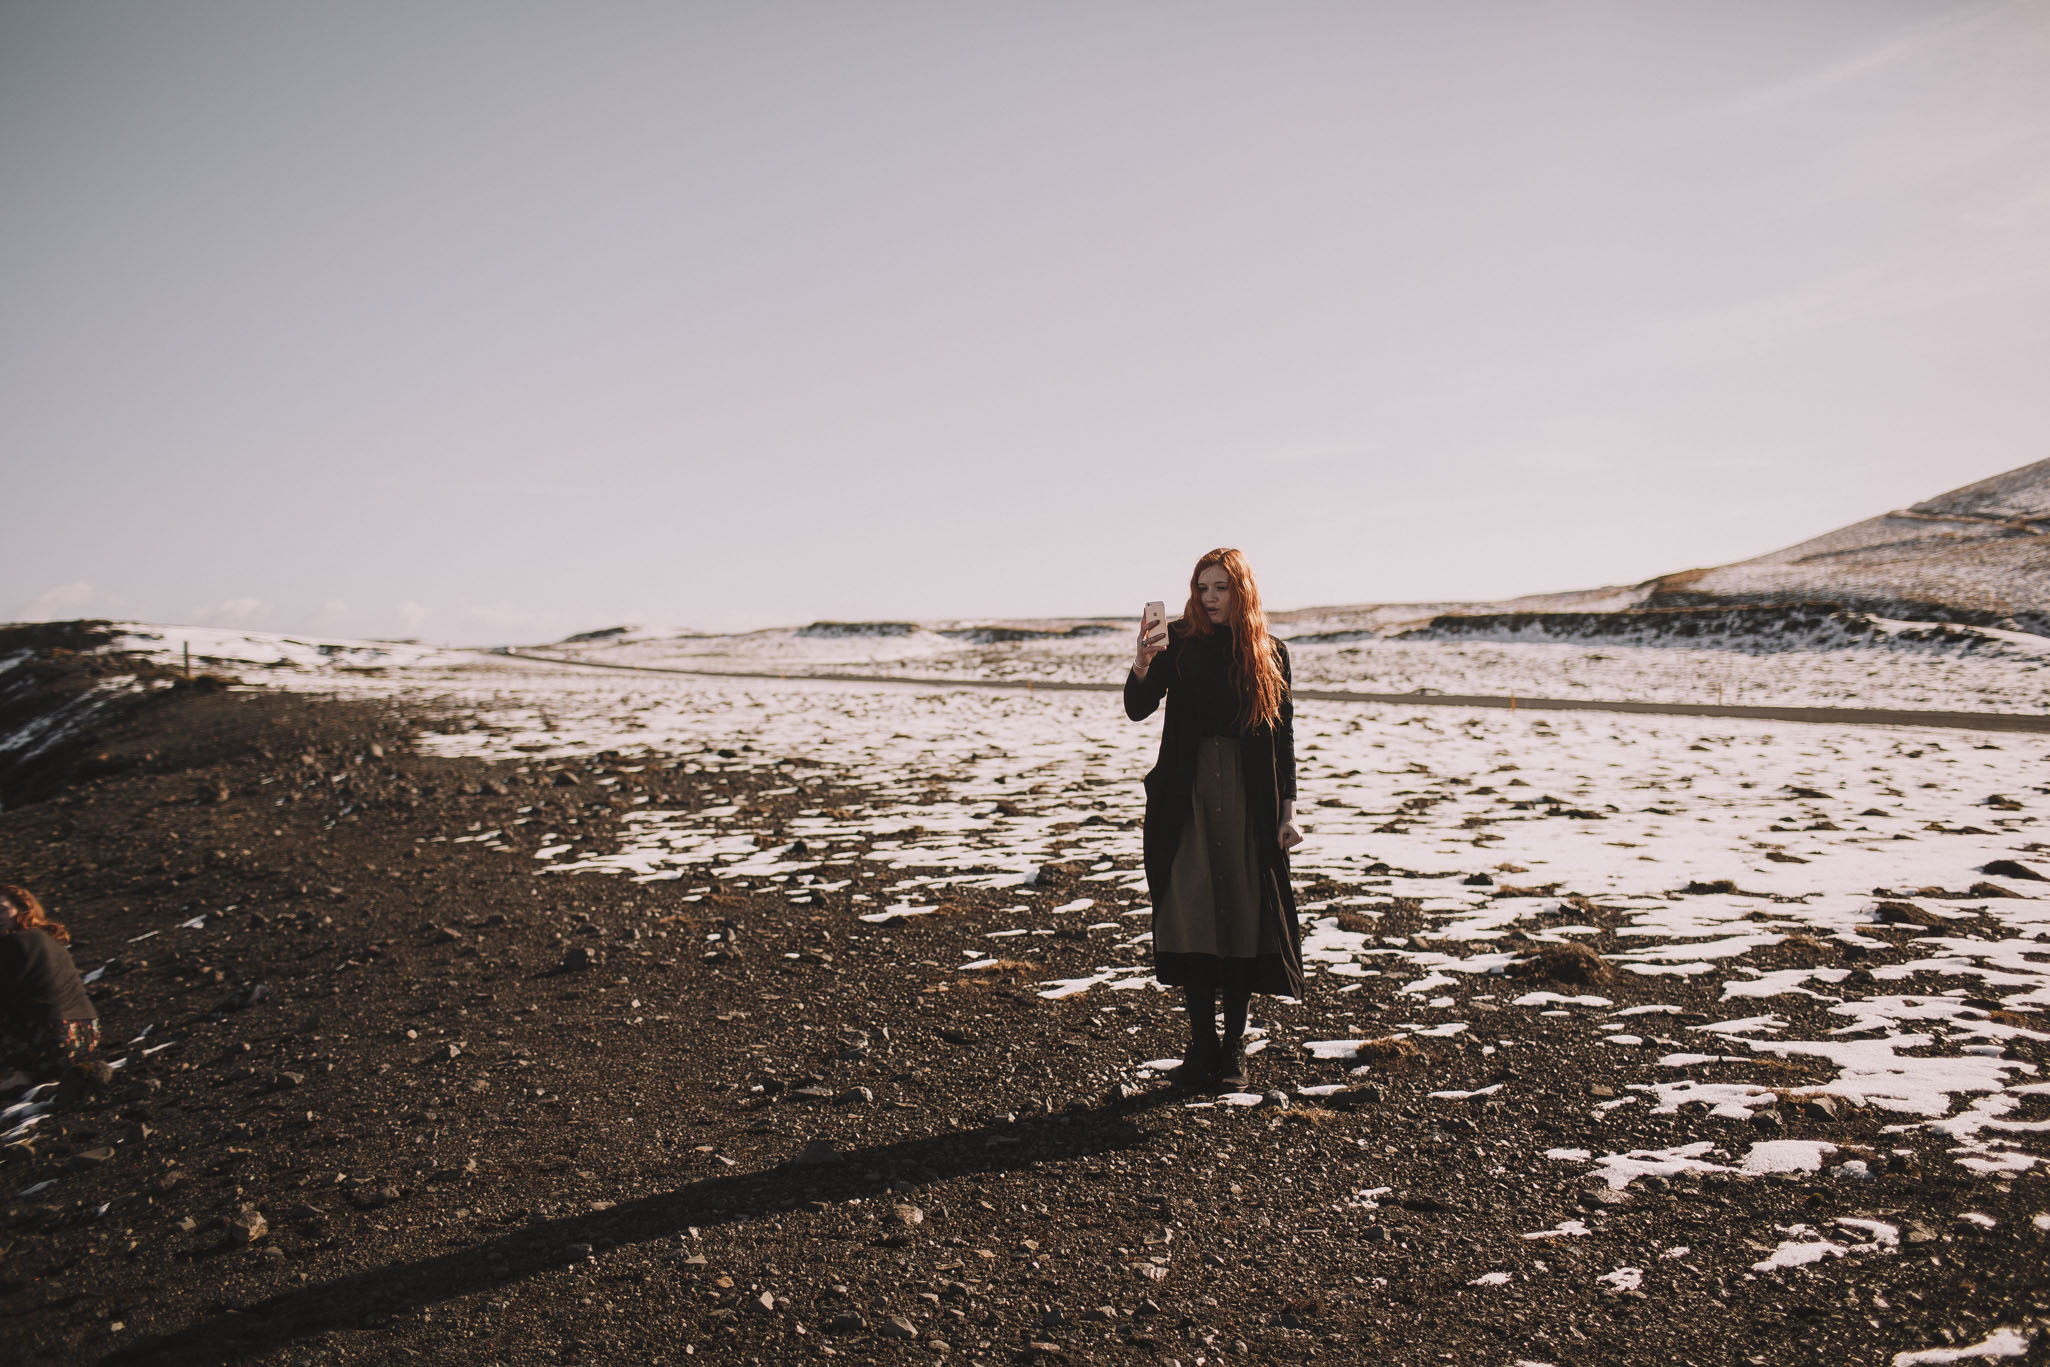 Road-trip-Islande-Iceland-Voyage-Travel-Portrait-Jérémy-Boyer-Sunny-day-between-Skogafoss-Dyrholaey-3.jpg